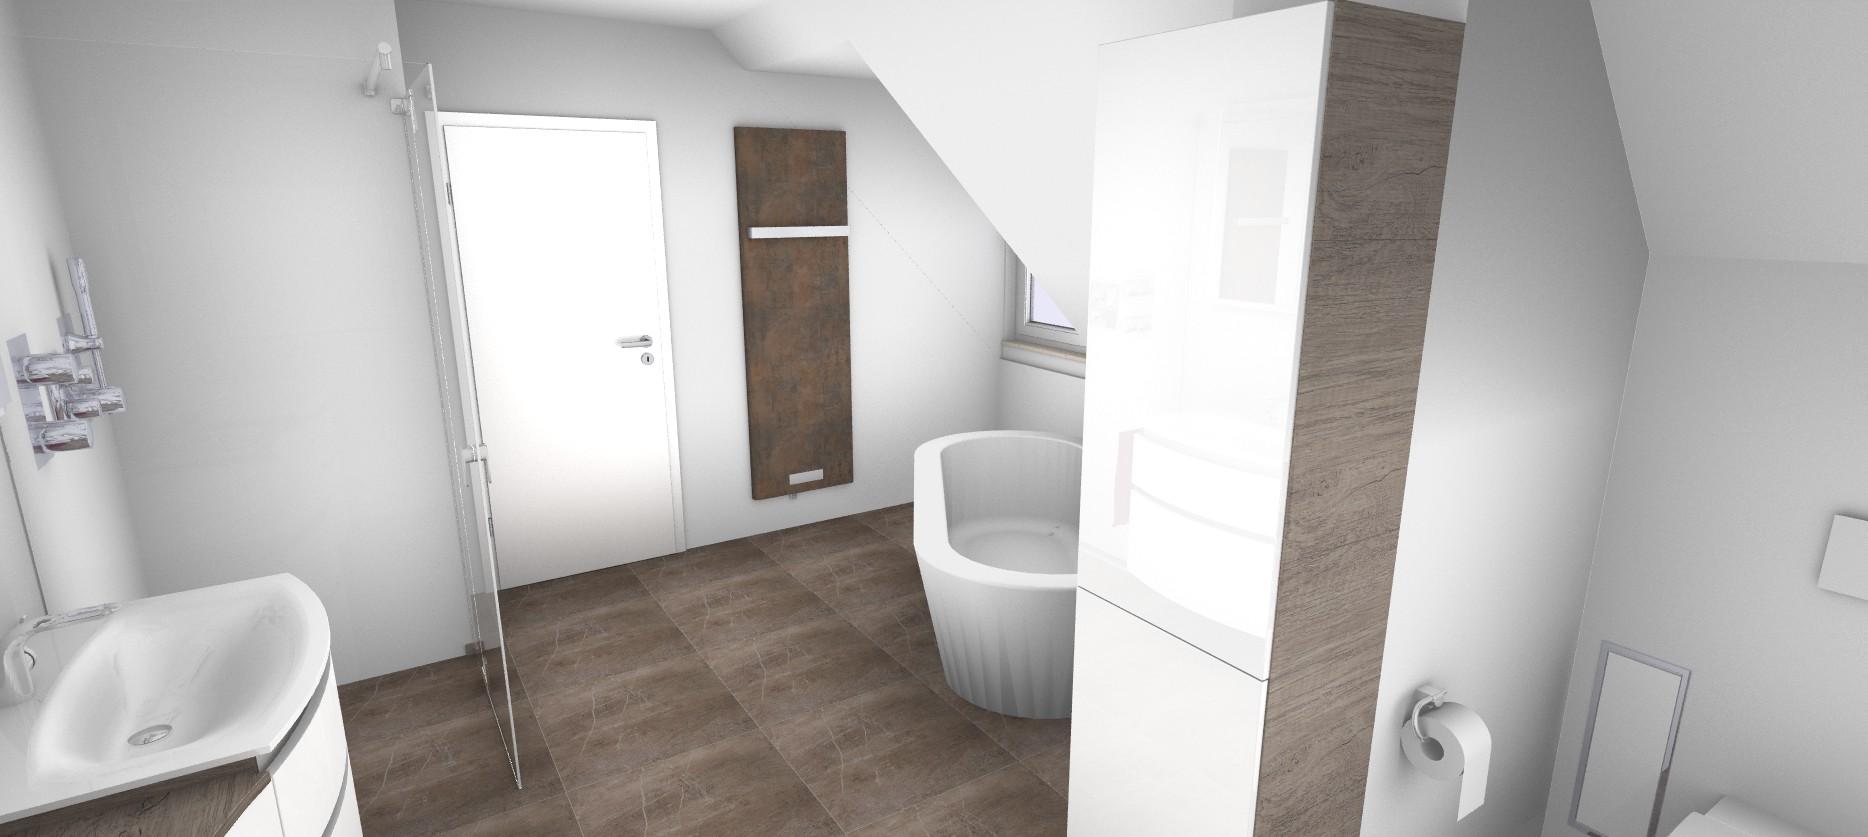 3D Blick in das geplante große Badezimmer